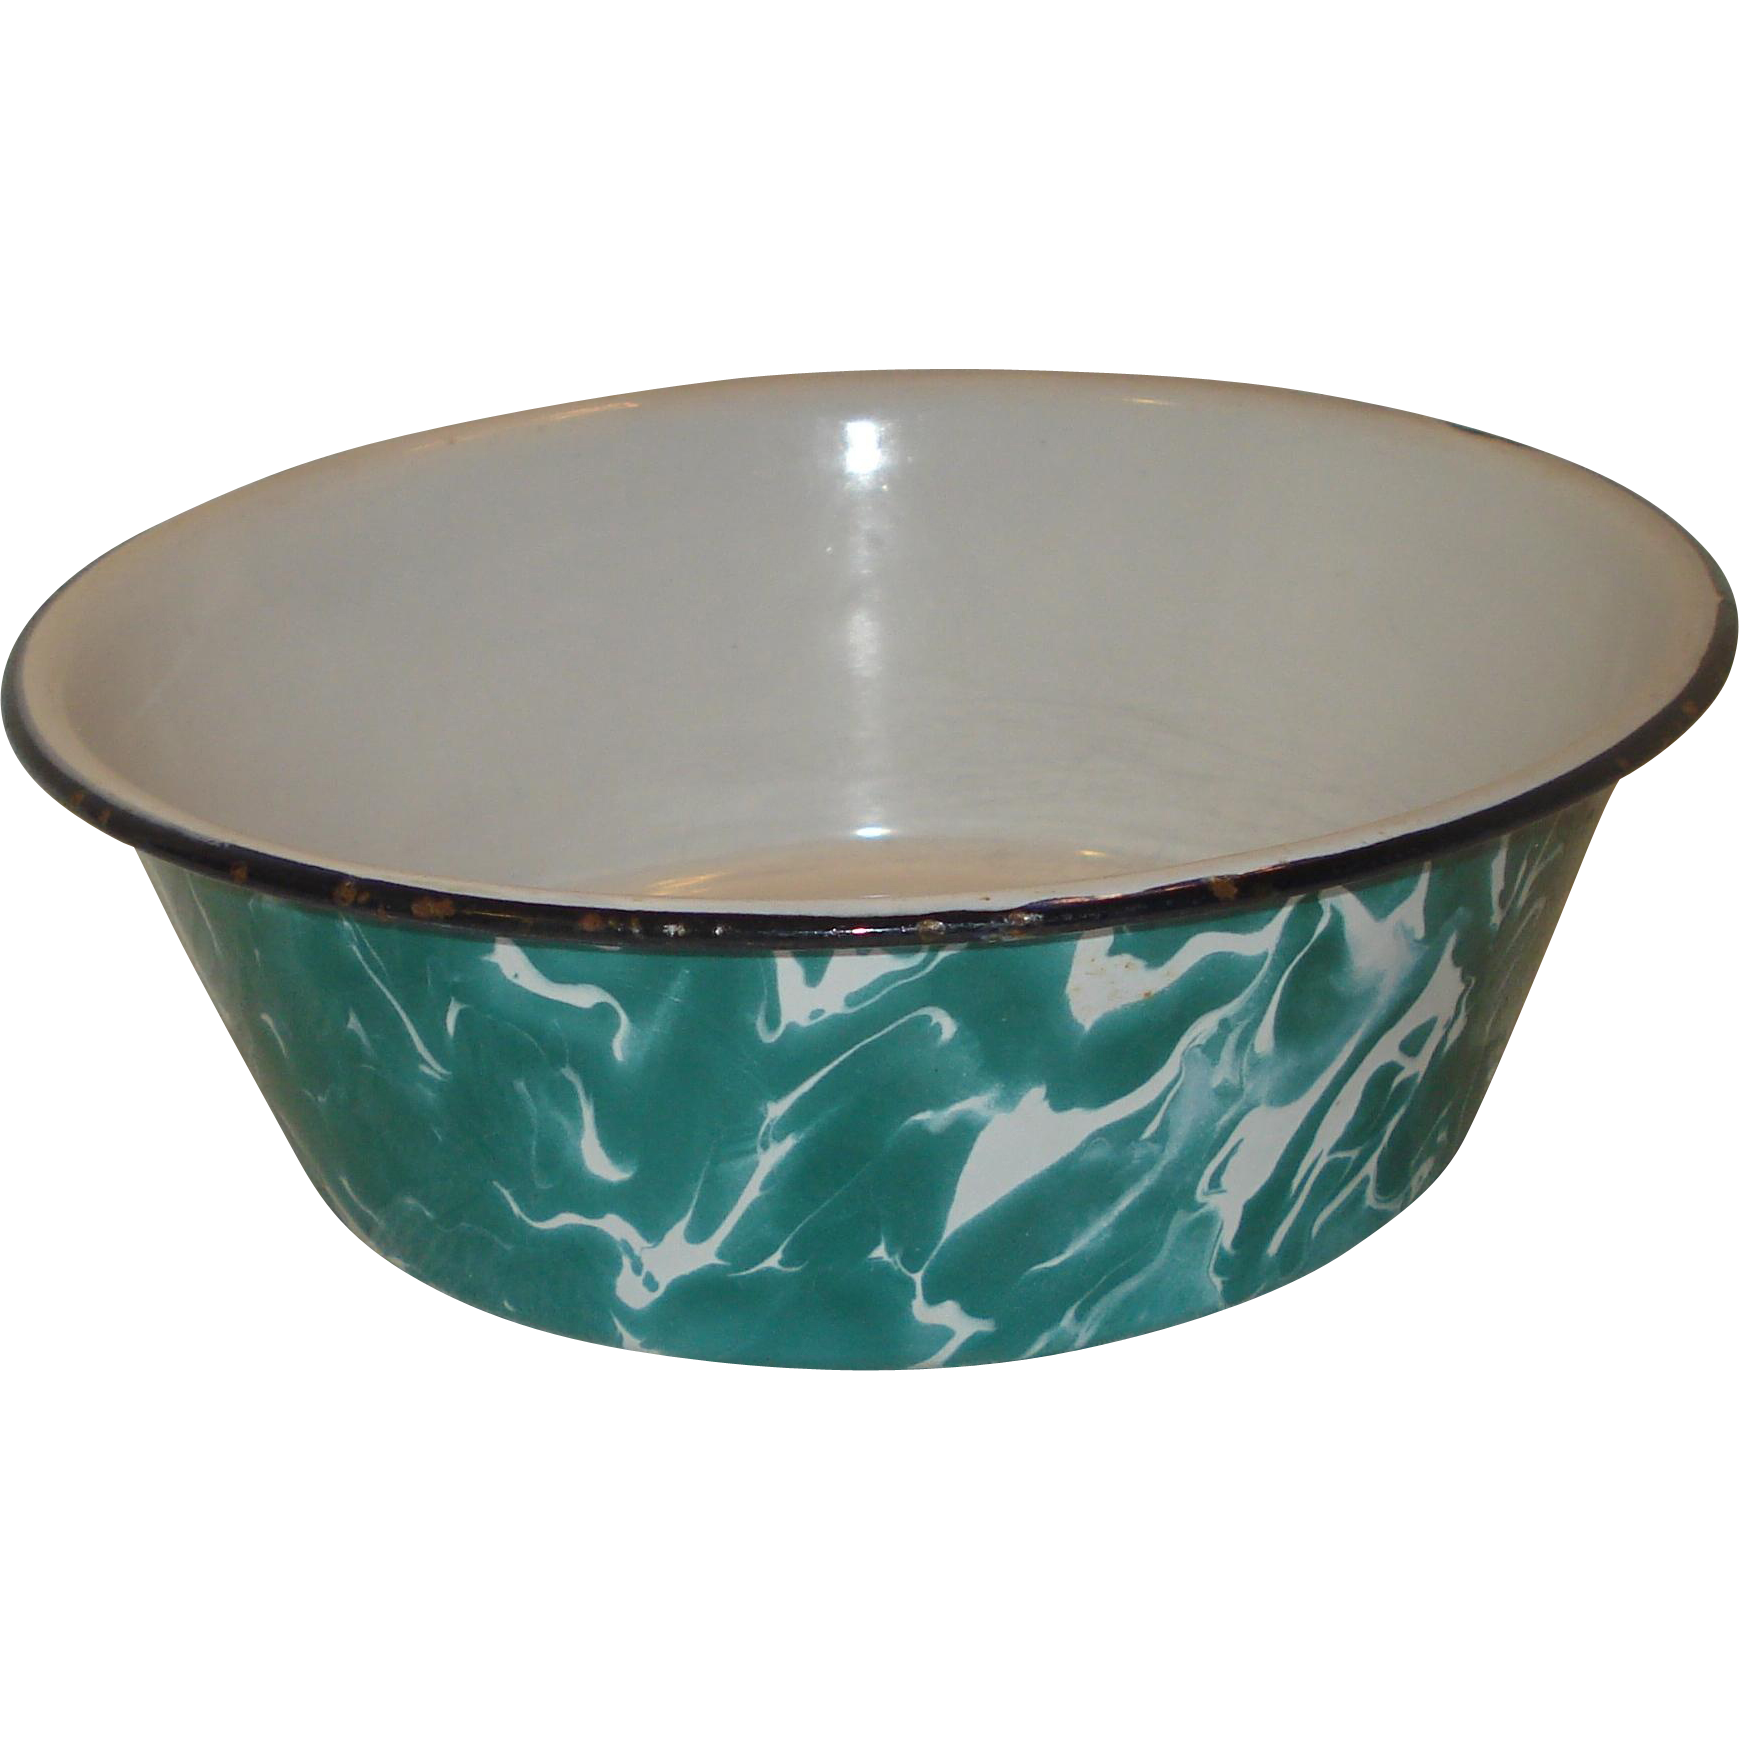 Vintage Green & White Swirl Enamelware bowl